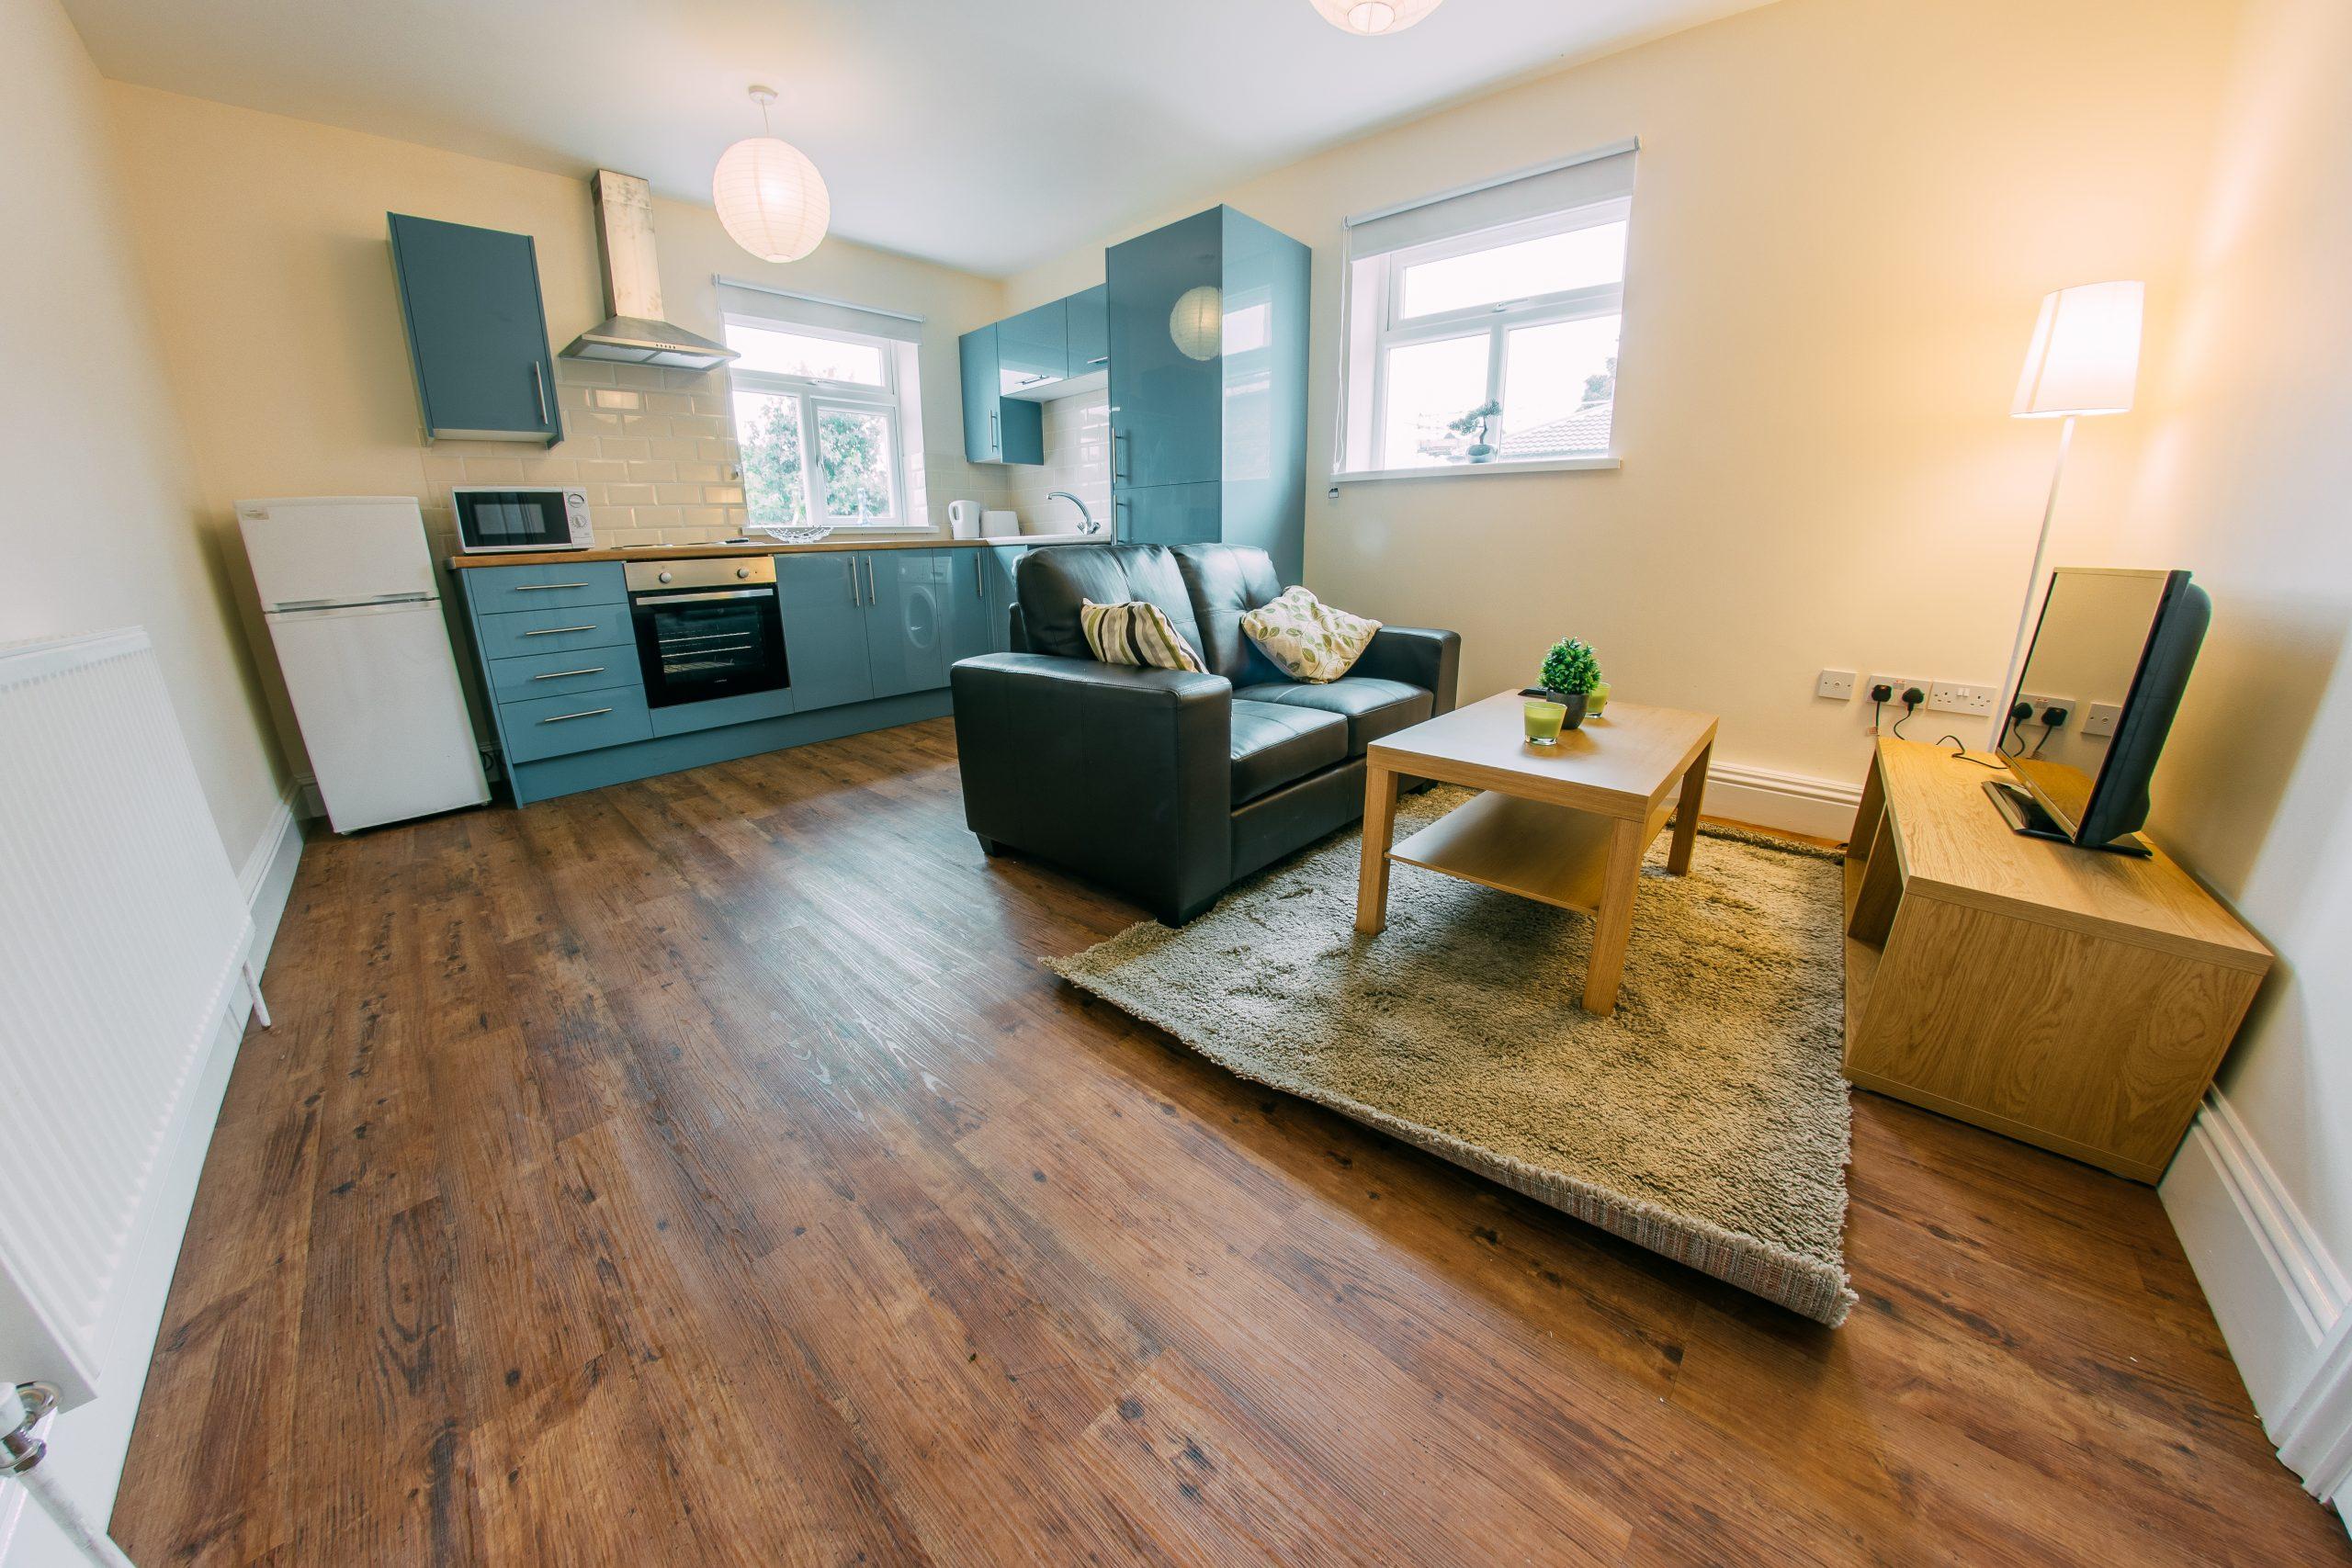 student apartments hull, student flats hull, student accommodation hull